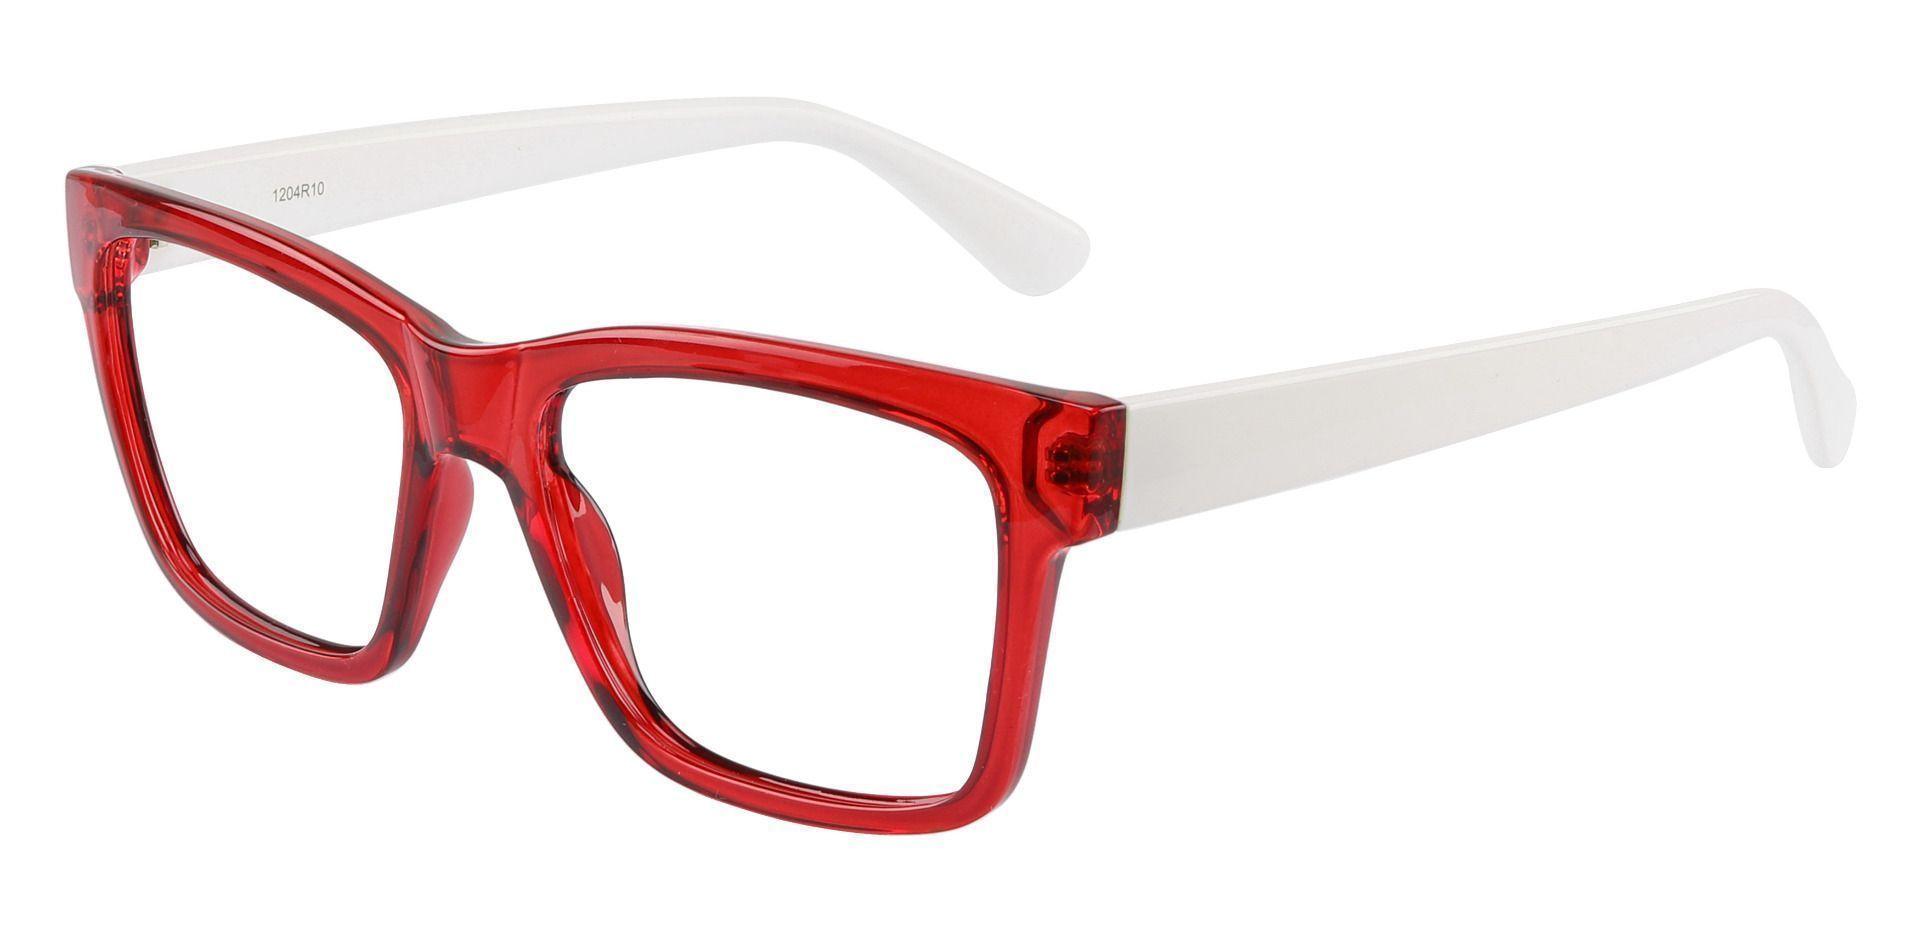 Brinley Square Eyeglasses Frame - Red Crystal/White Temple